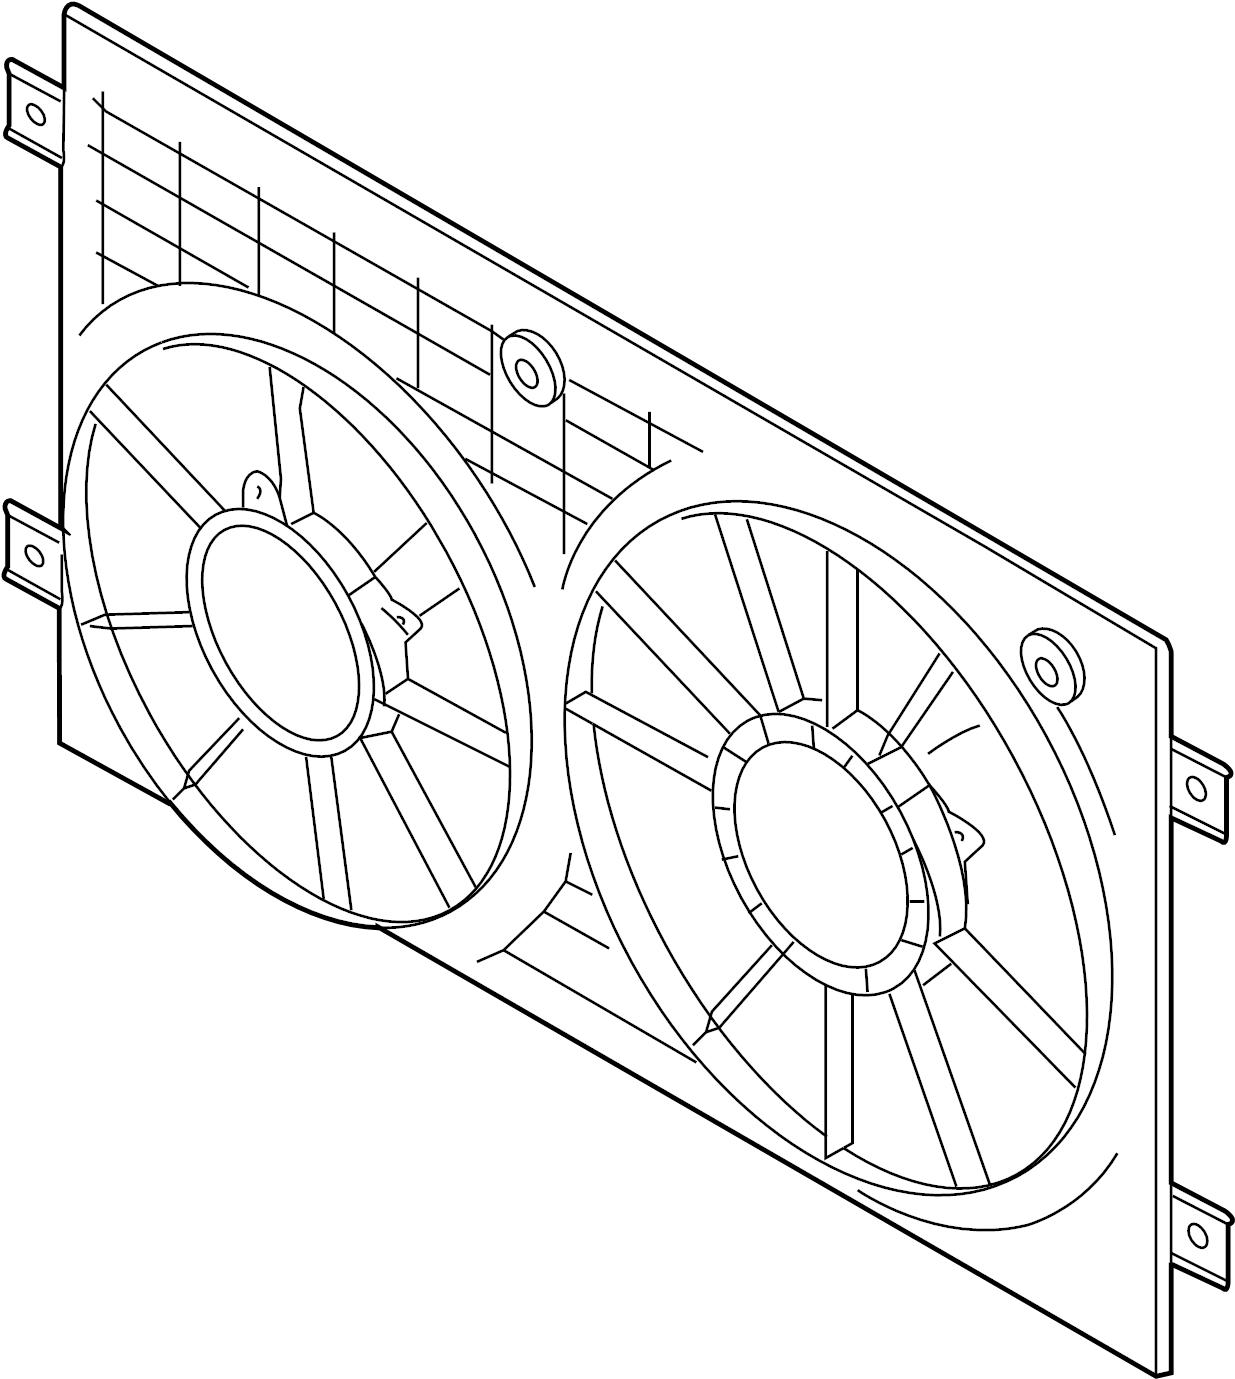 2012 Volkswagen Passat Engine Cooling Fan Shroud (Front